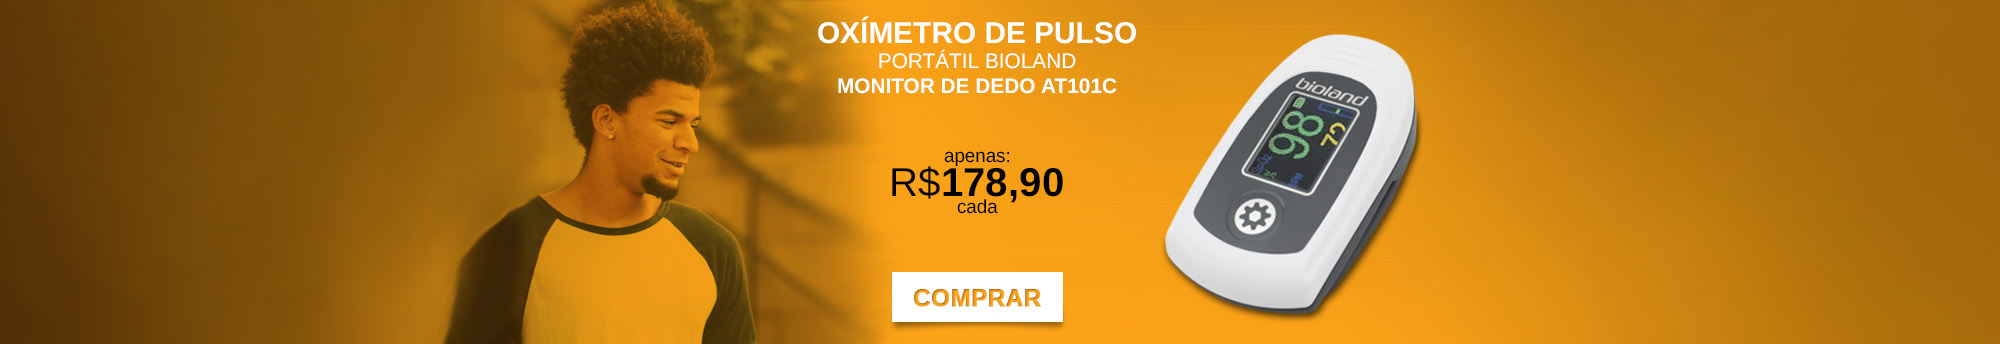 Oximetro Bioland